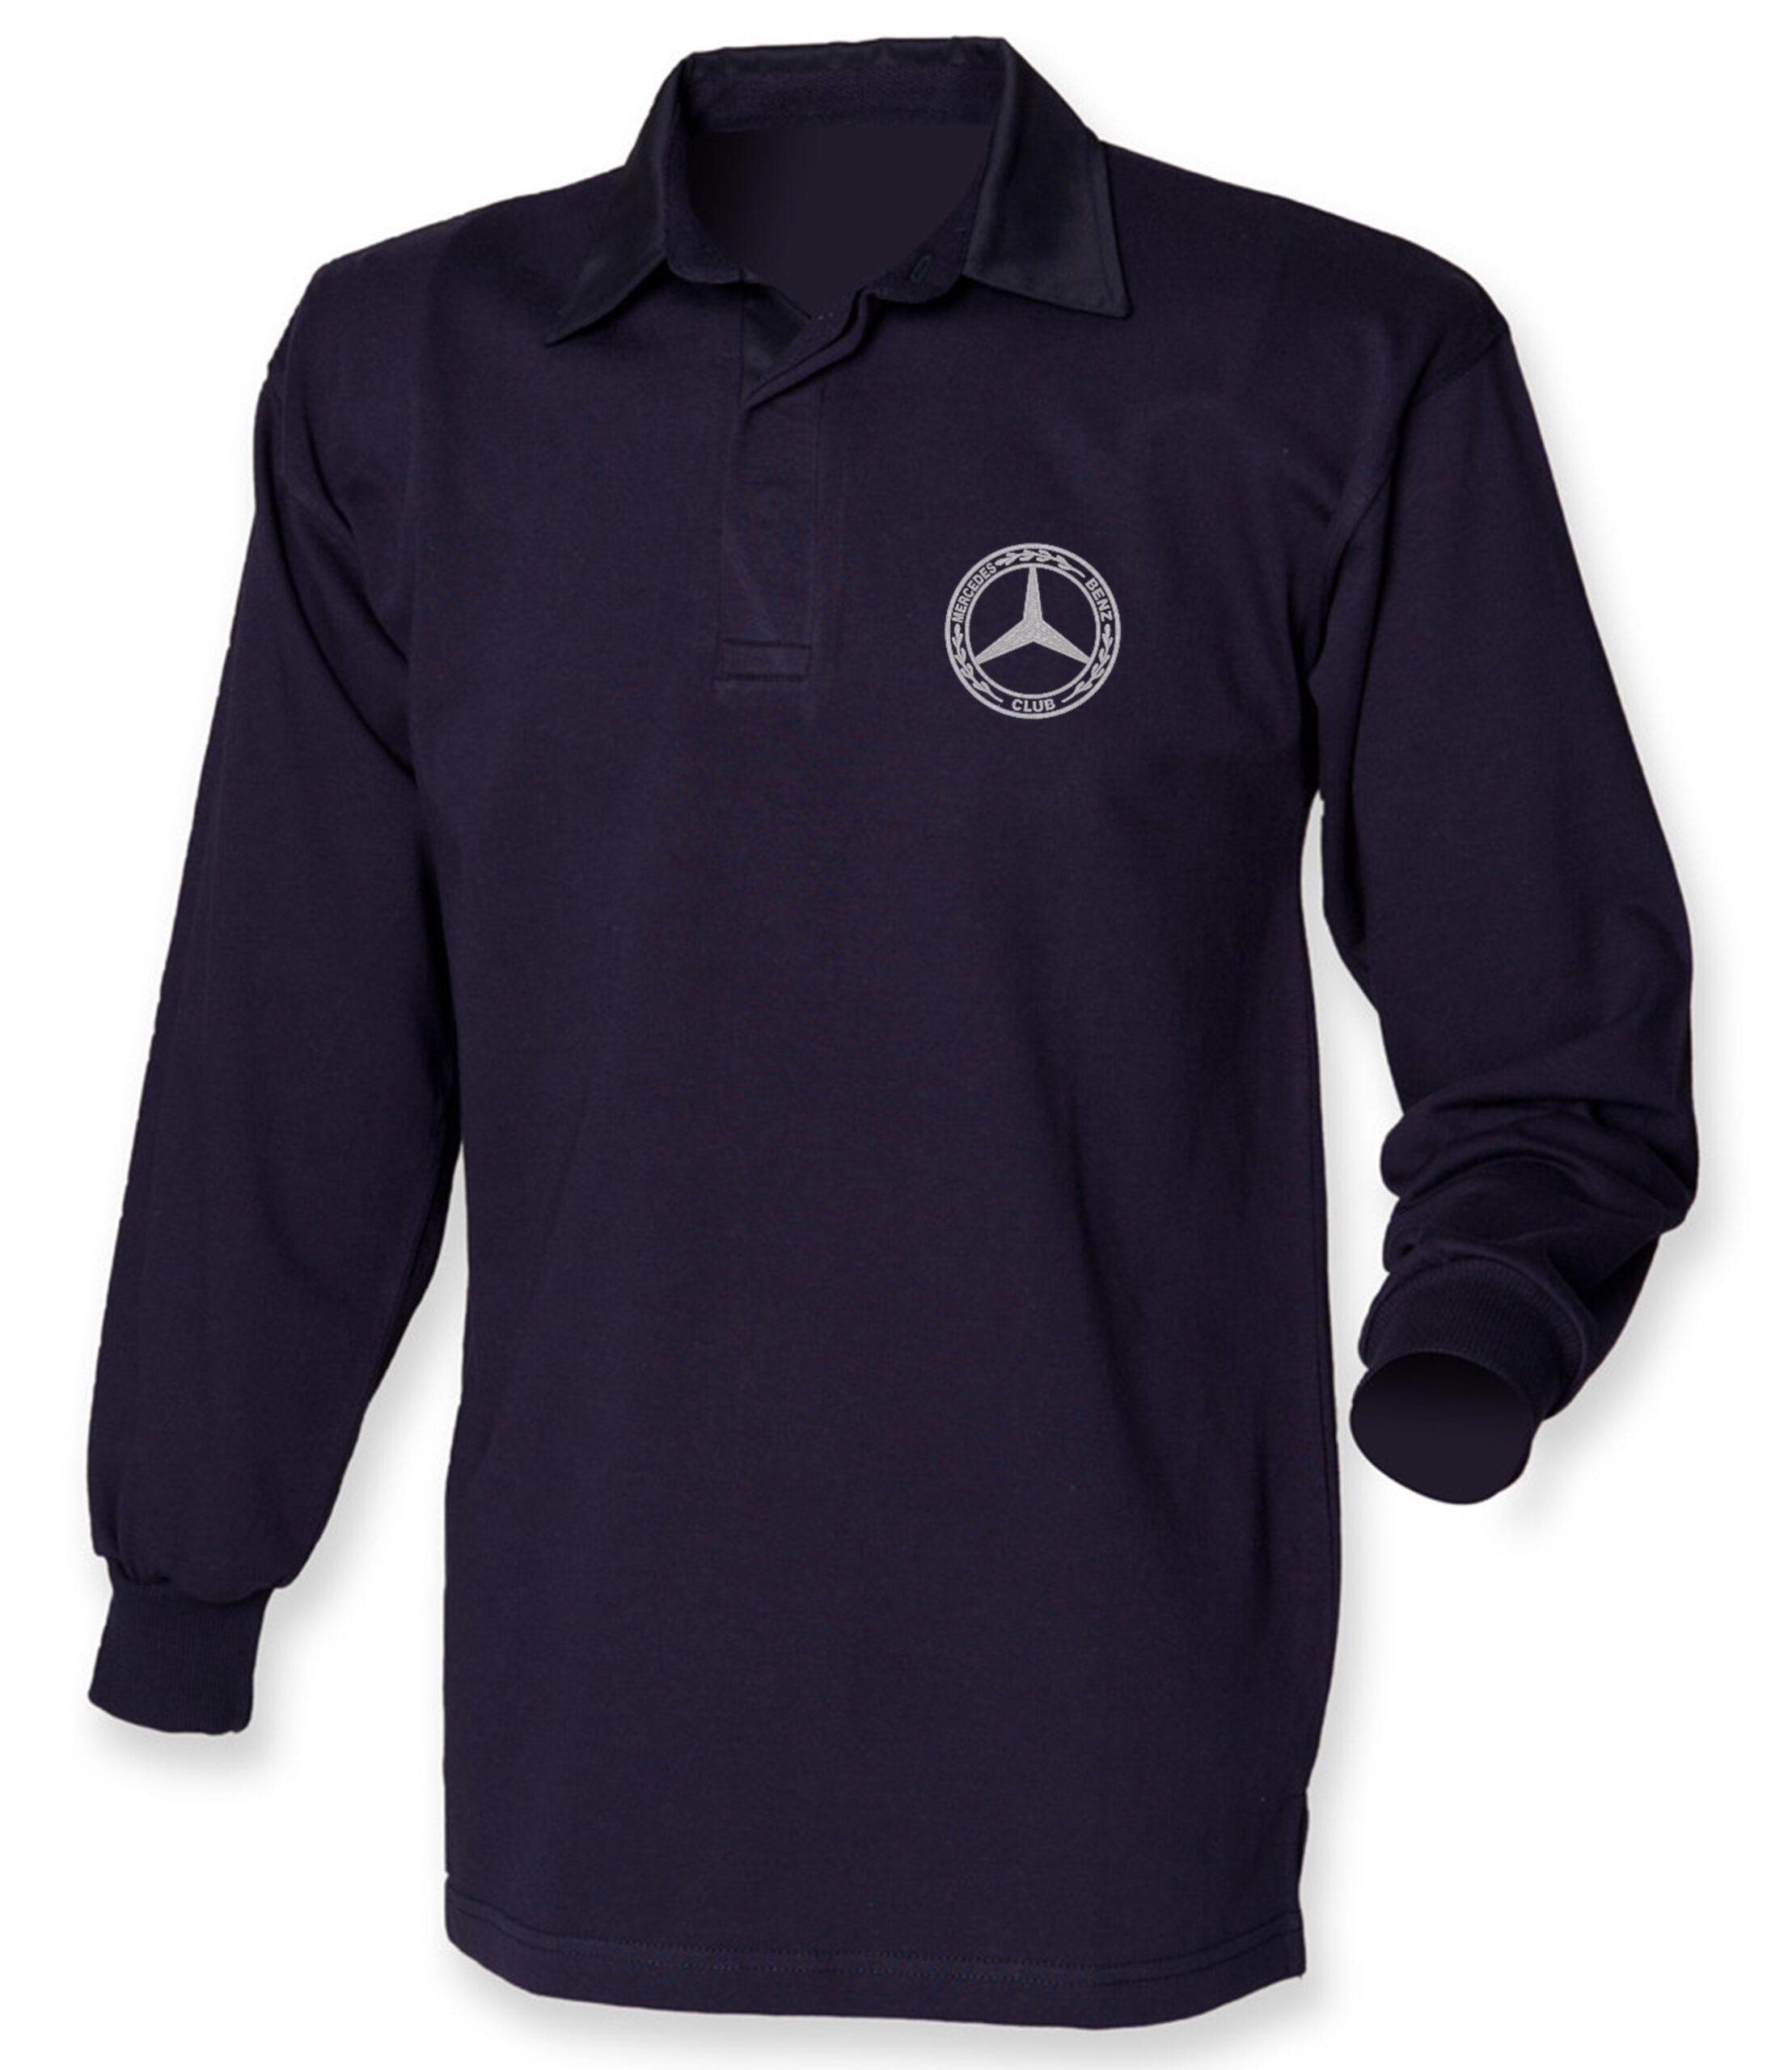 Mercedes-Benz Club Classic Rugby Shirt Navy Navy